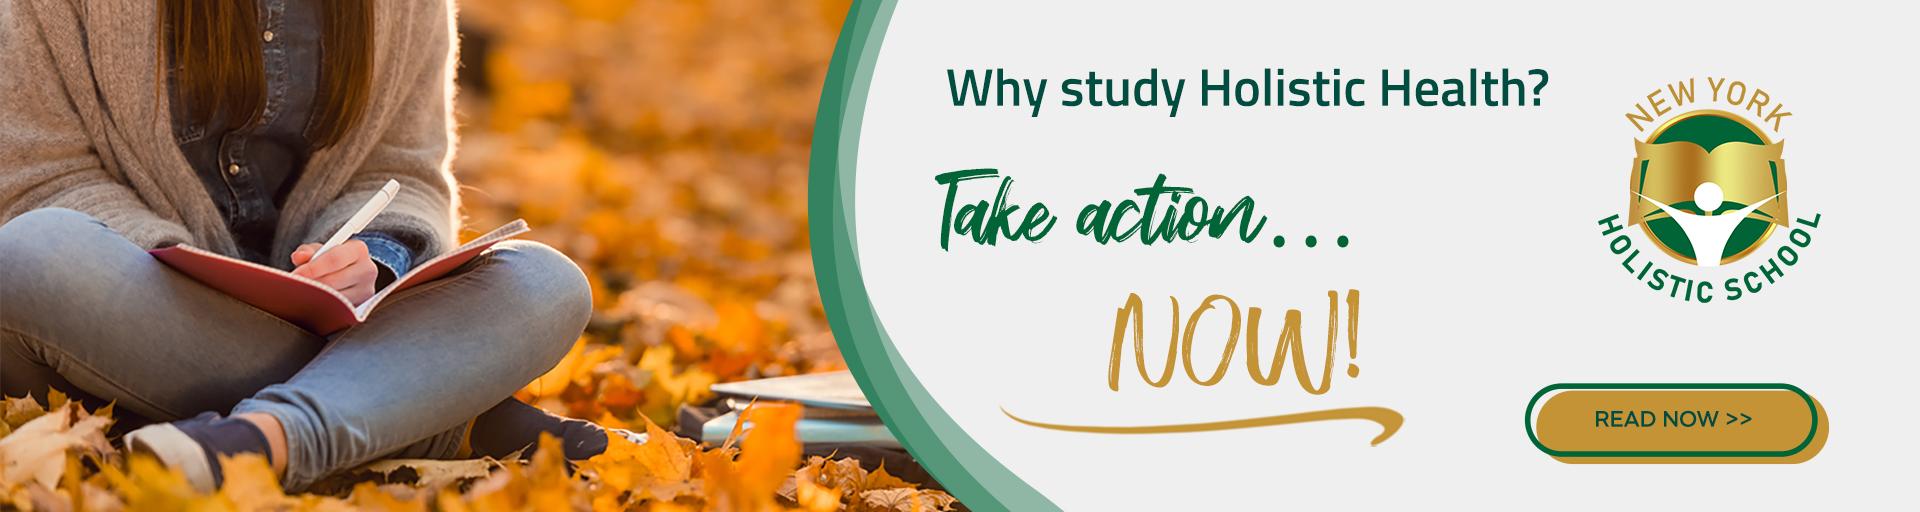 Why-study-Holistic-Health